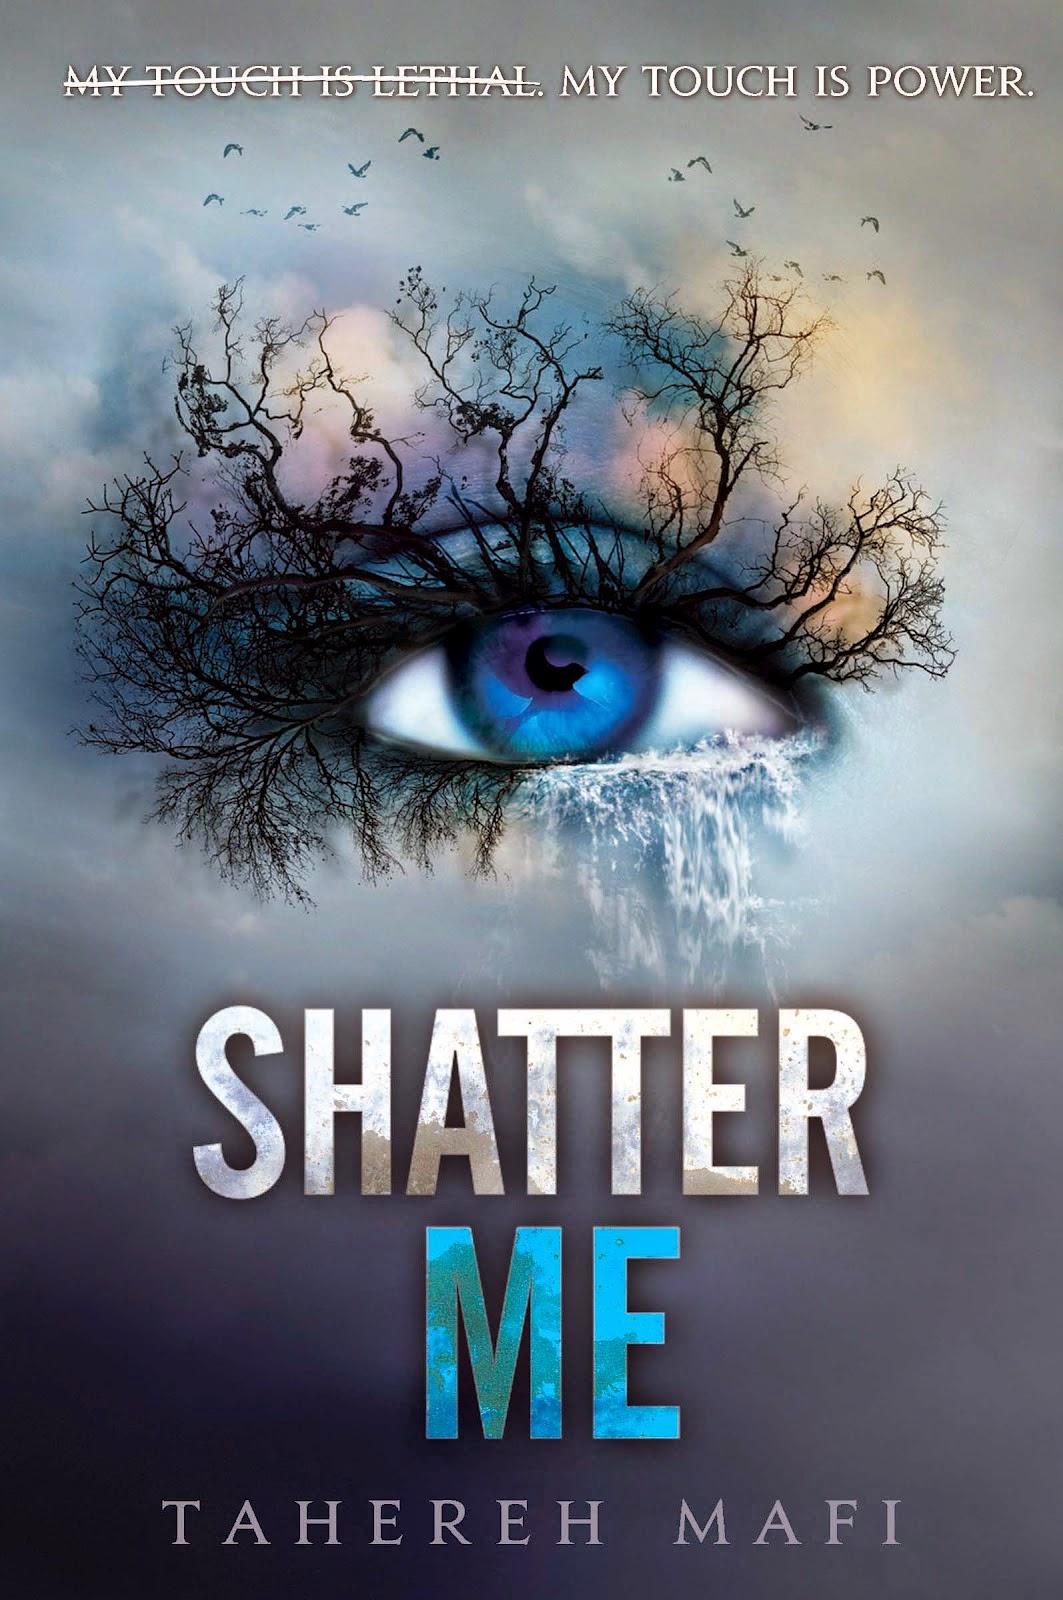 http://www.goodreads.com/book/show/10429045-shatter-me